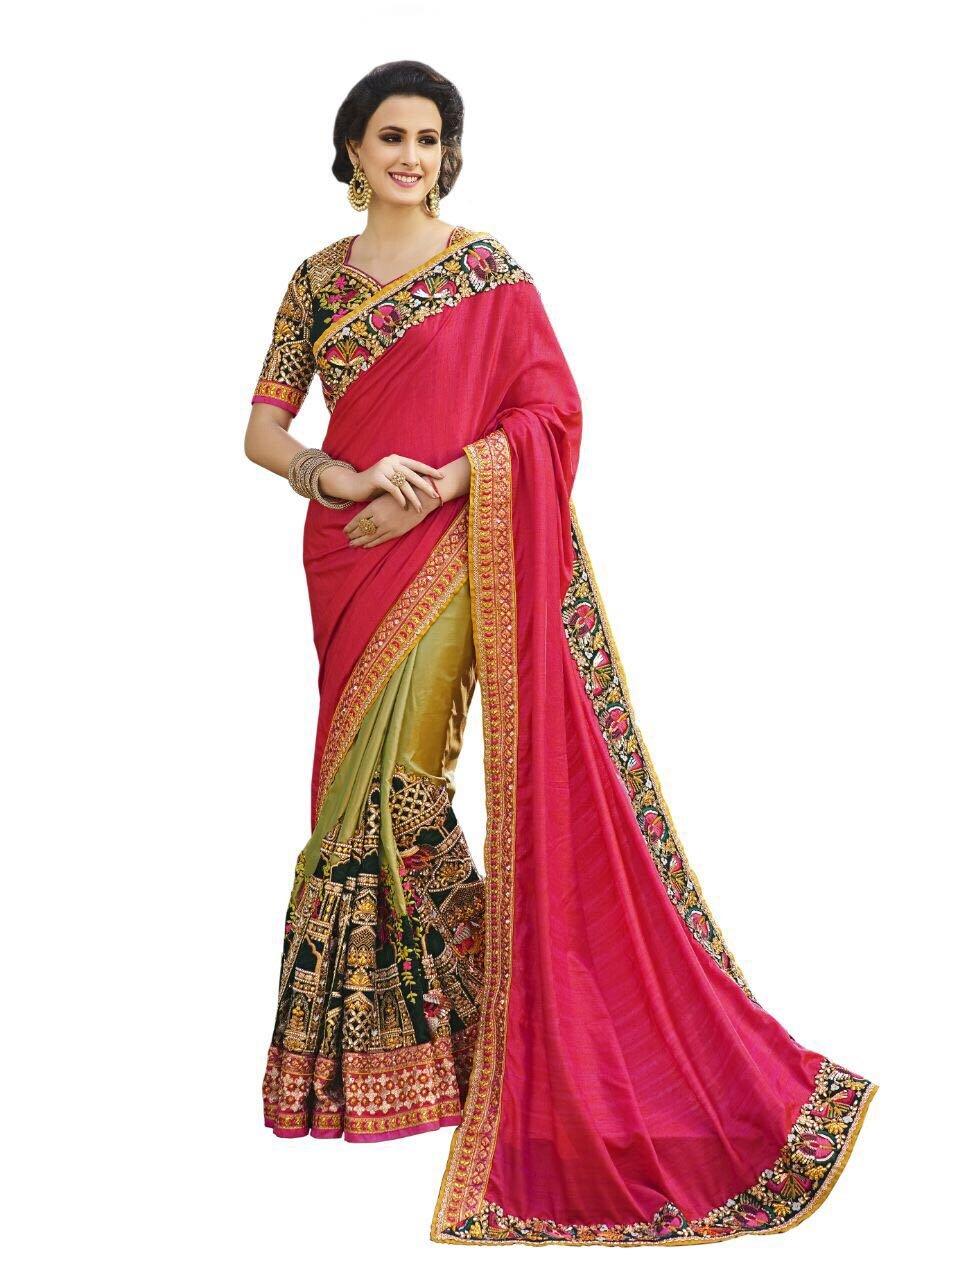 DurgaPuja Navratri Festival Heavy Saree Wedding Indian Sari Gown Muslim Women Dress Hijab Women Sare...